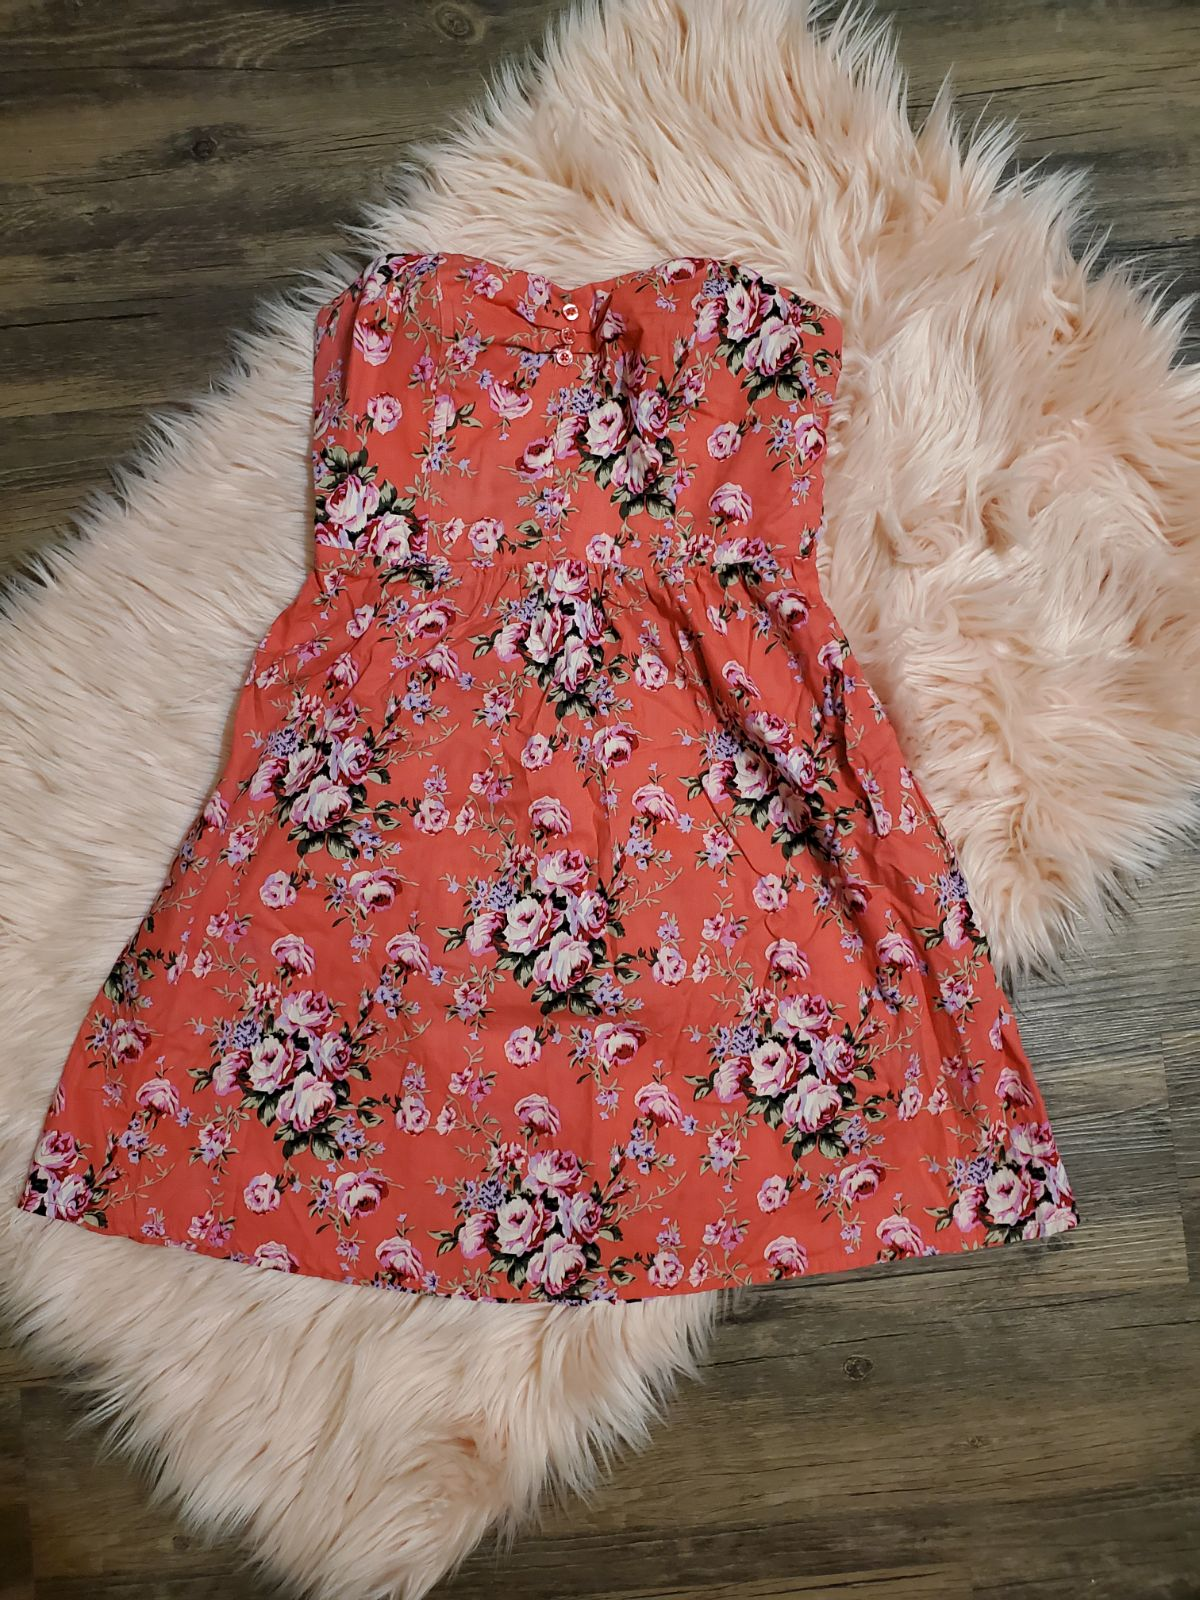 Cooperative Jonathan Martin Pink Red Boho Aztec Print Long Wrap Skirt 26 Waist Small S High Quality Goods Women's Clothing